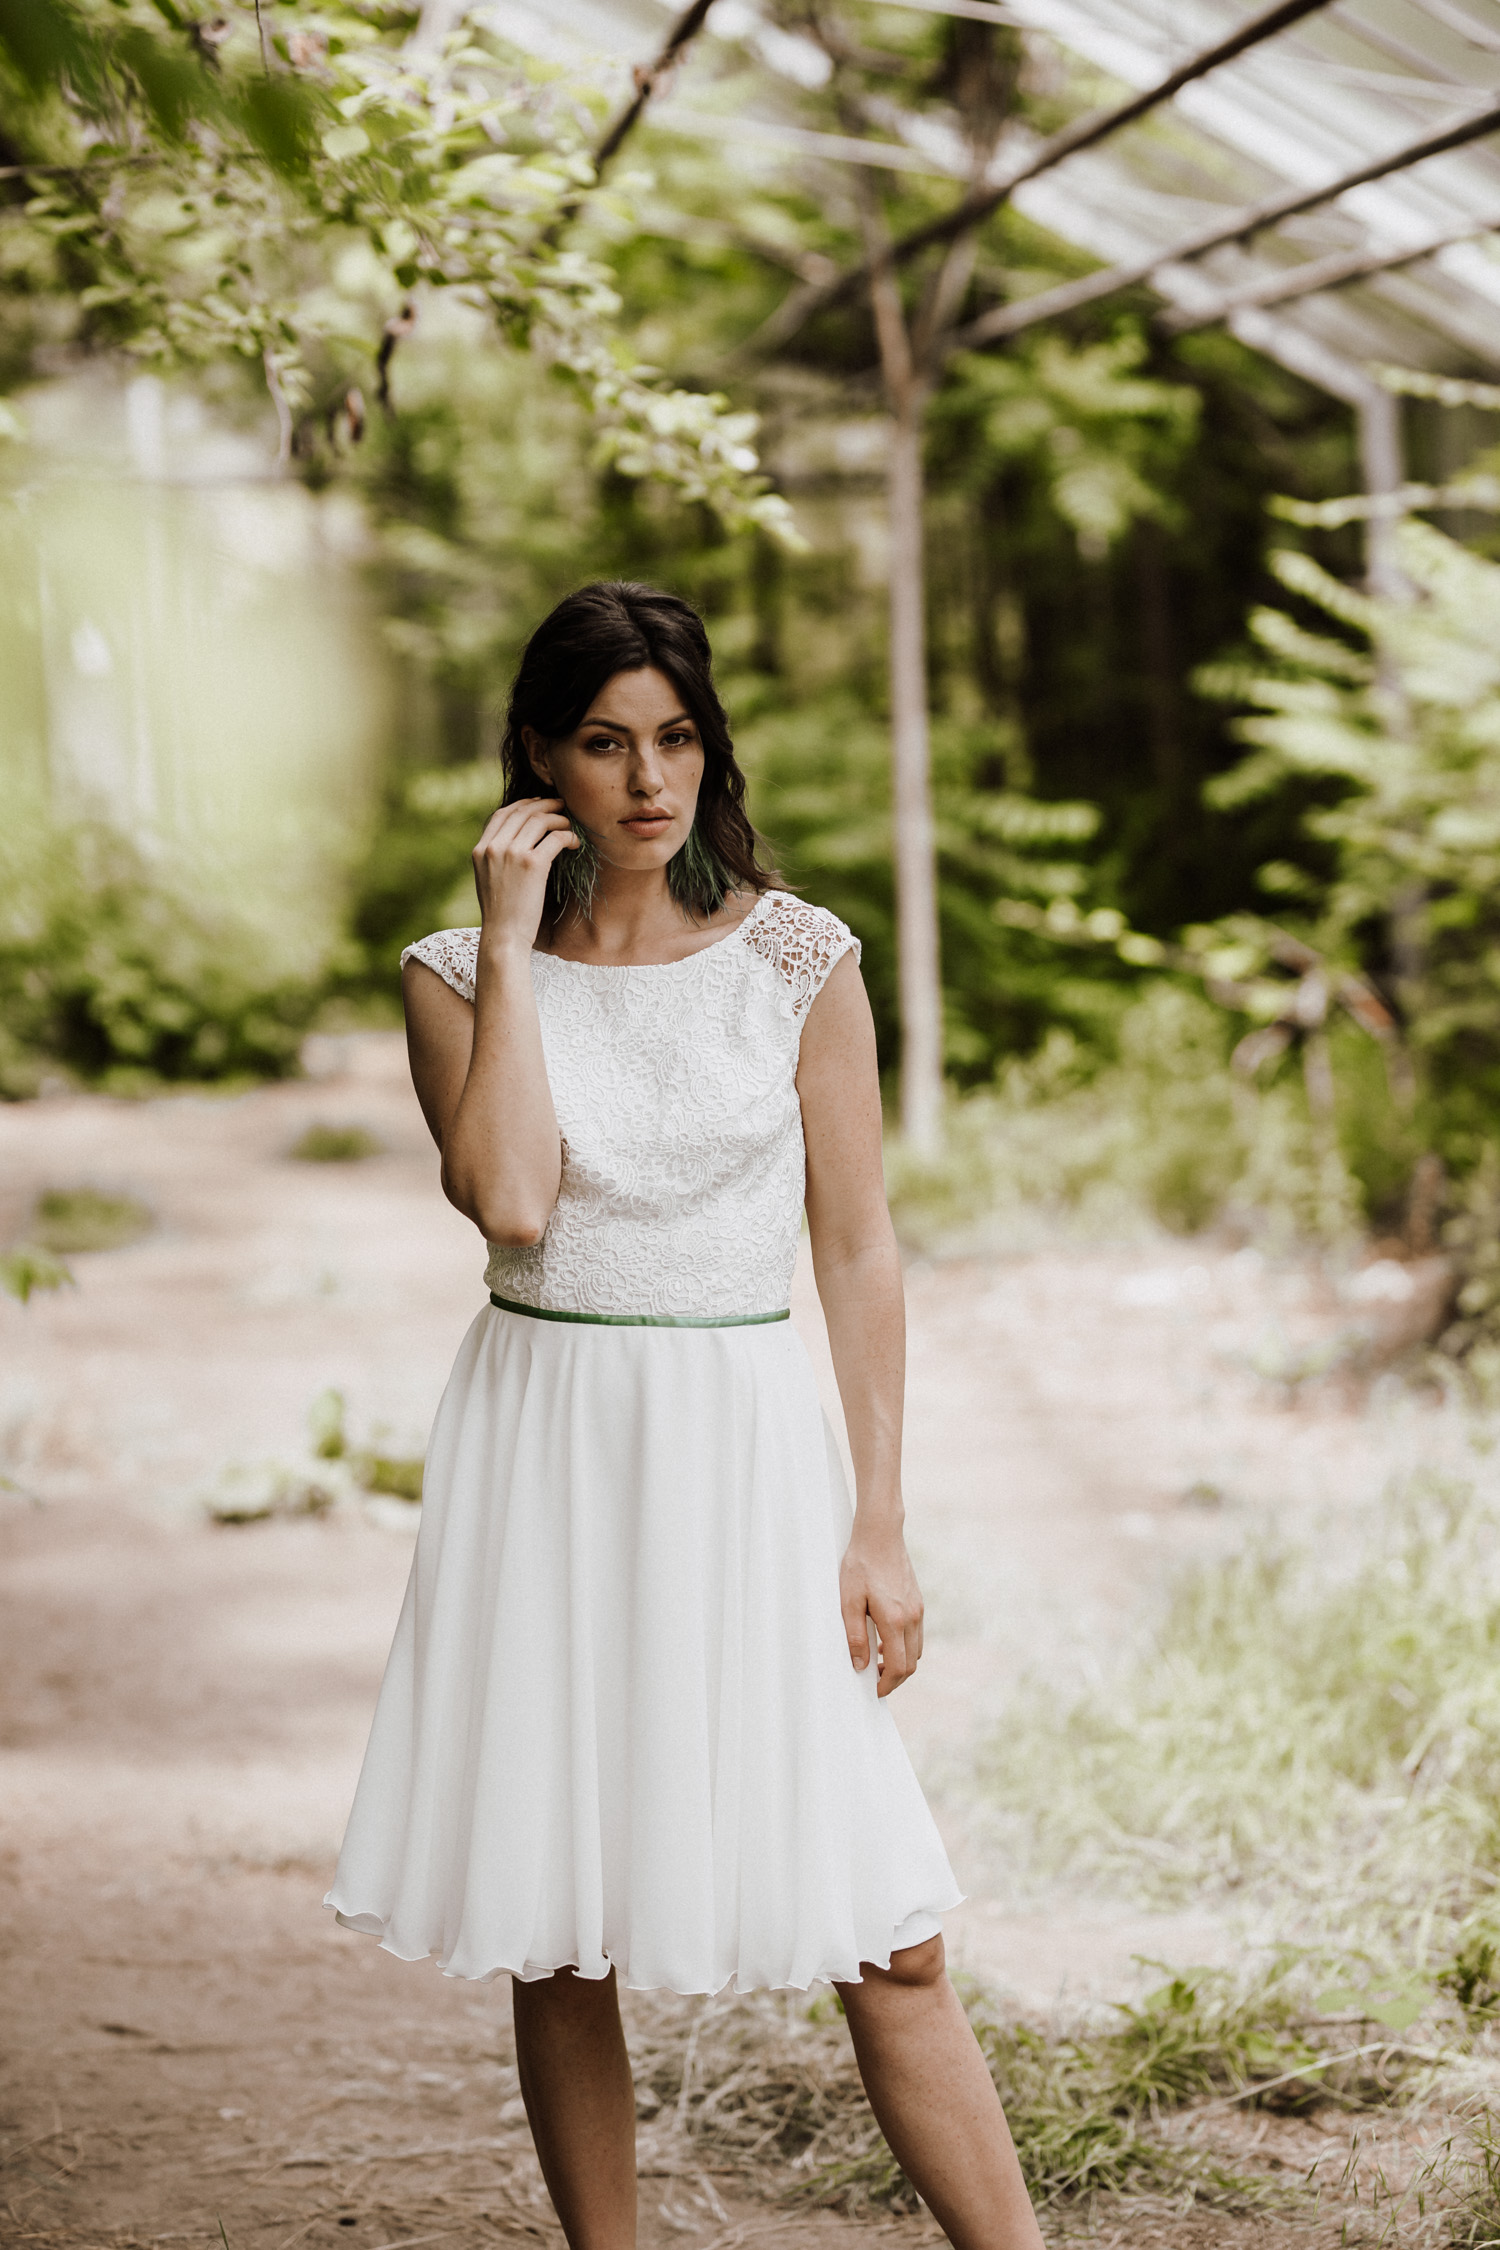 Brautkleid Standesamt kurz, Brautkleid Sommerhochzeit kurz, Brautkleid kurz, Brautkleid kurz Spitze